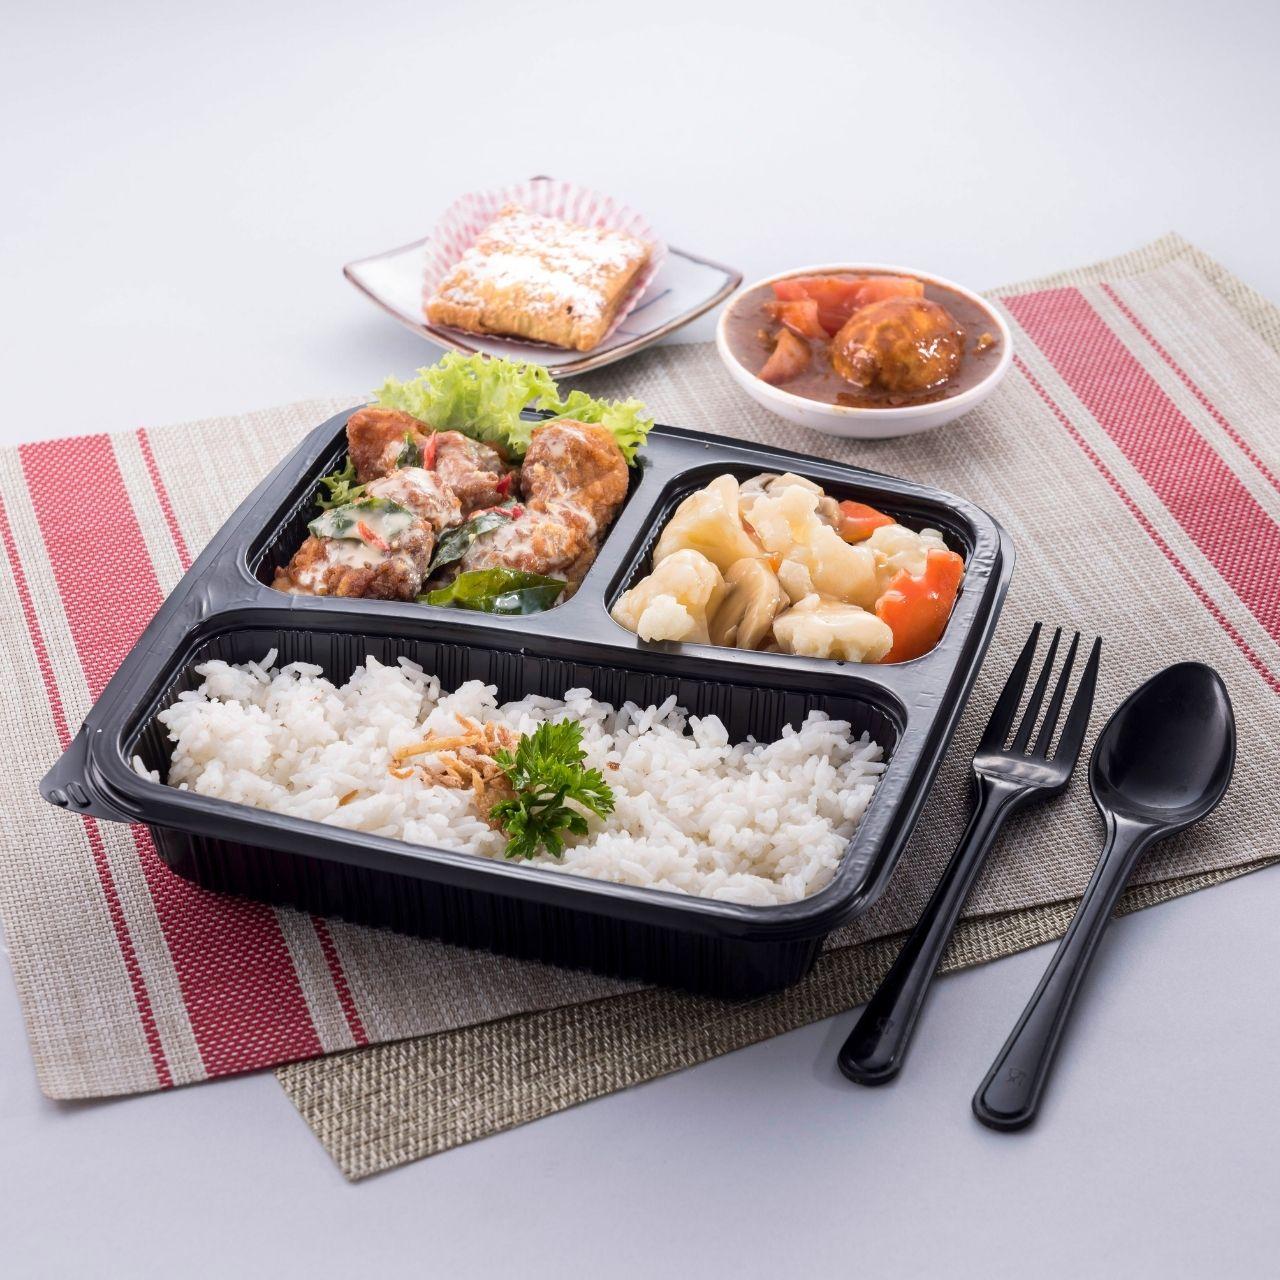 runningmen catering bento box steam rice with salted egg chicken